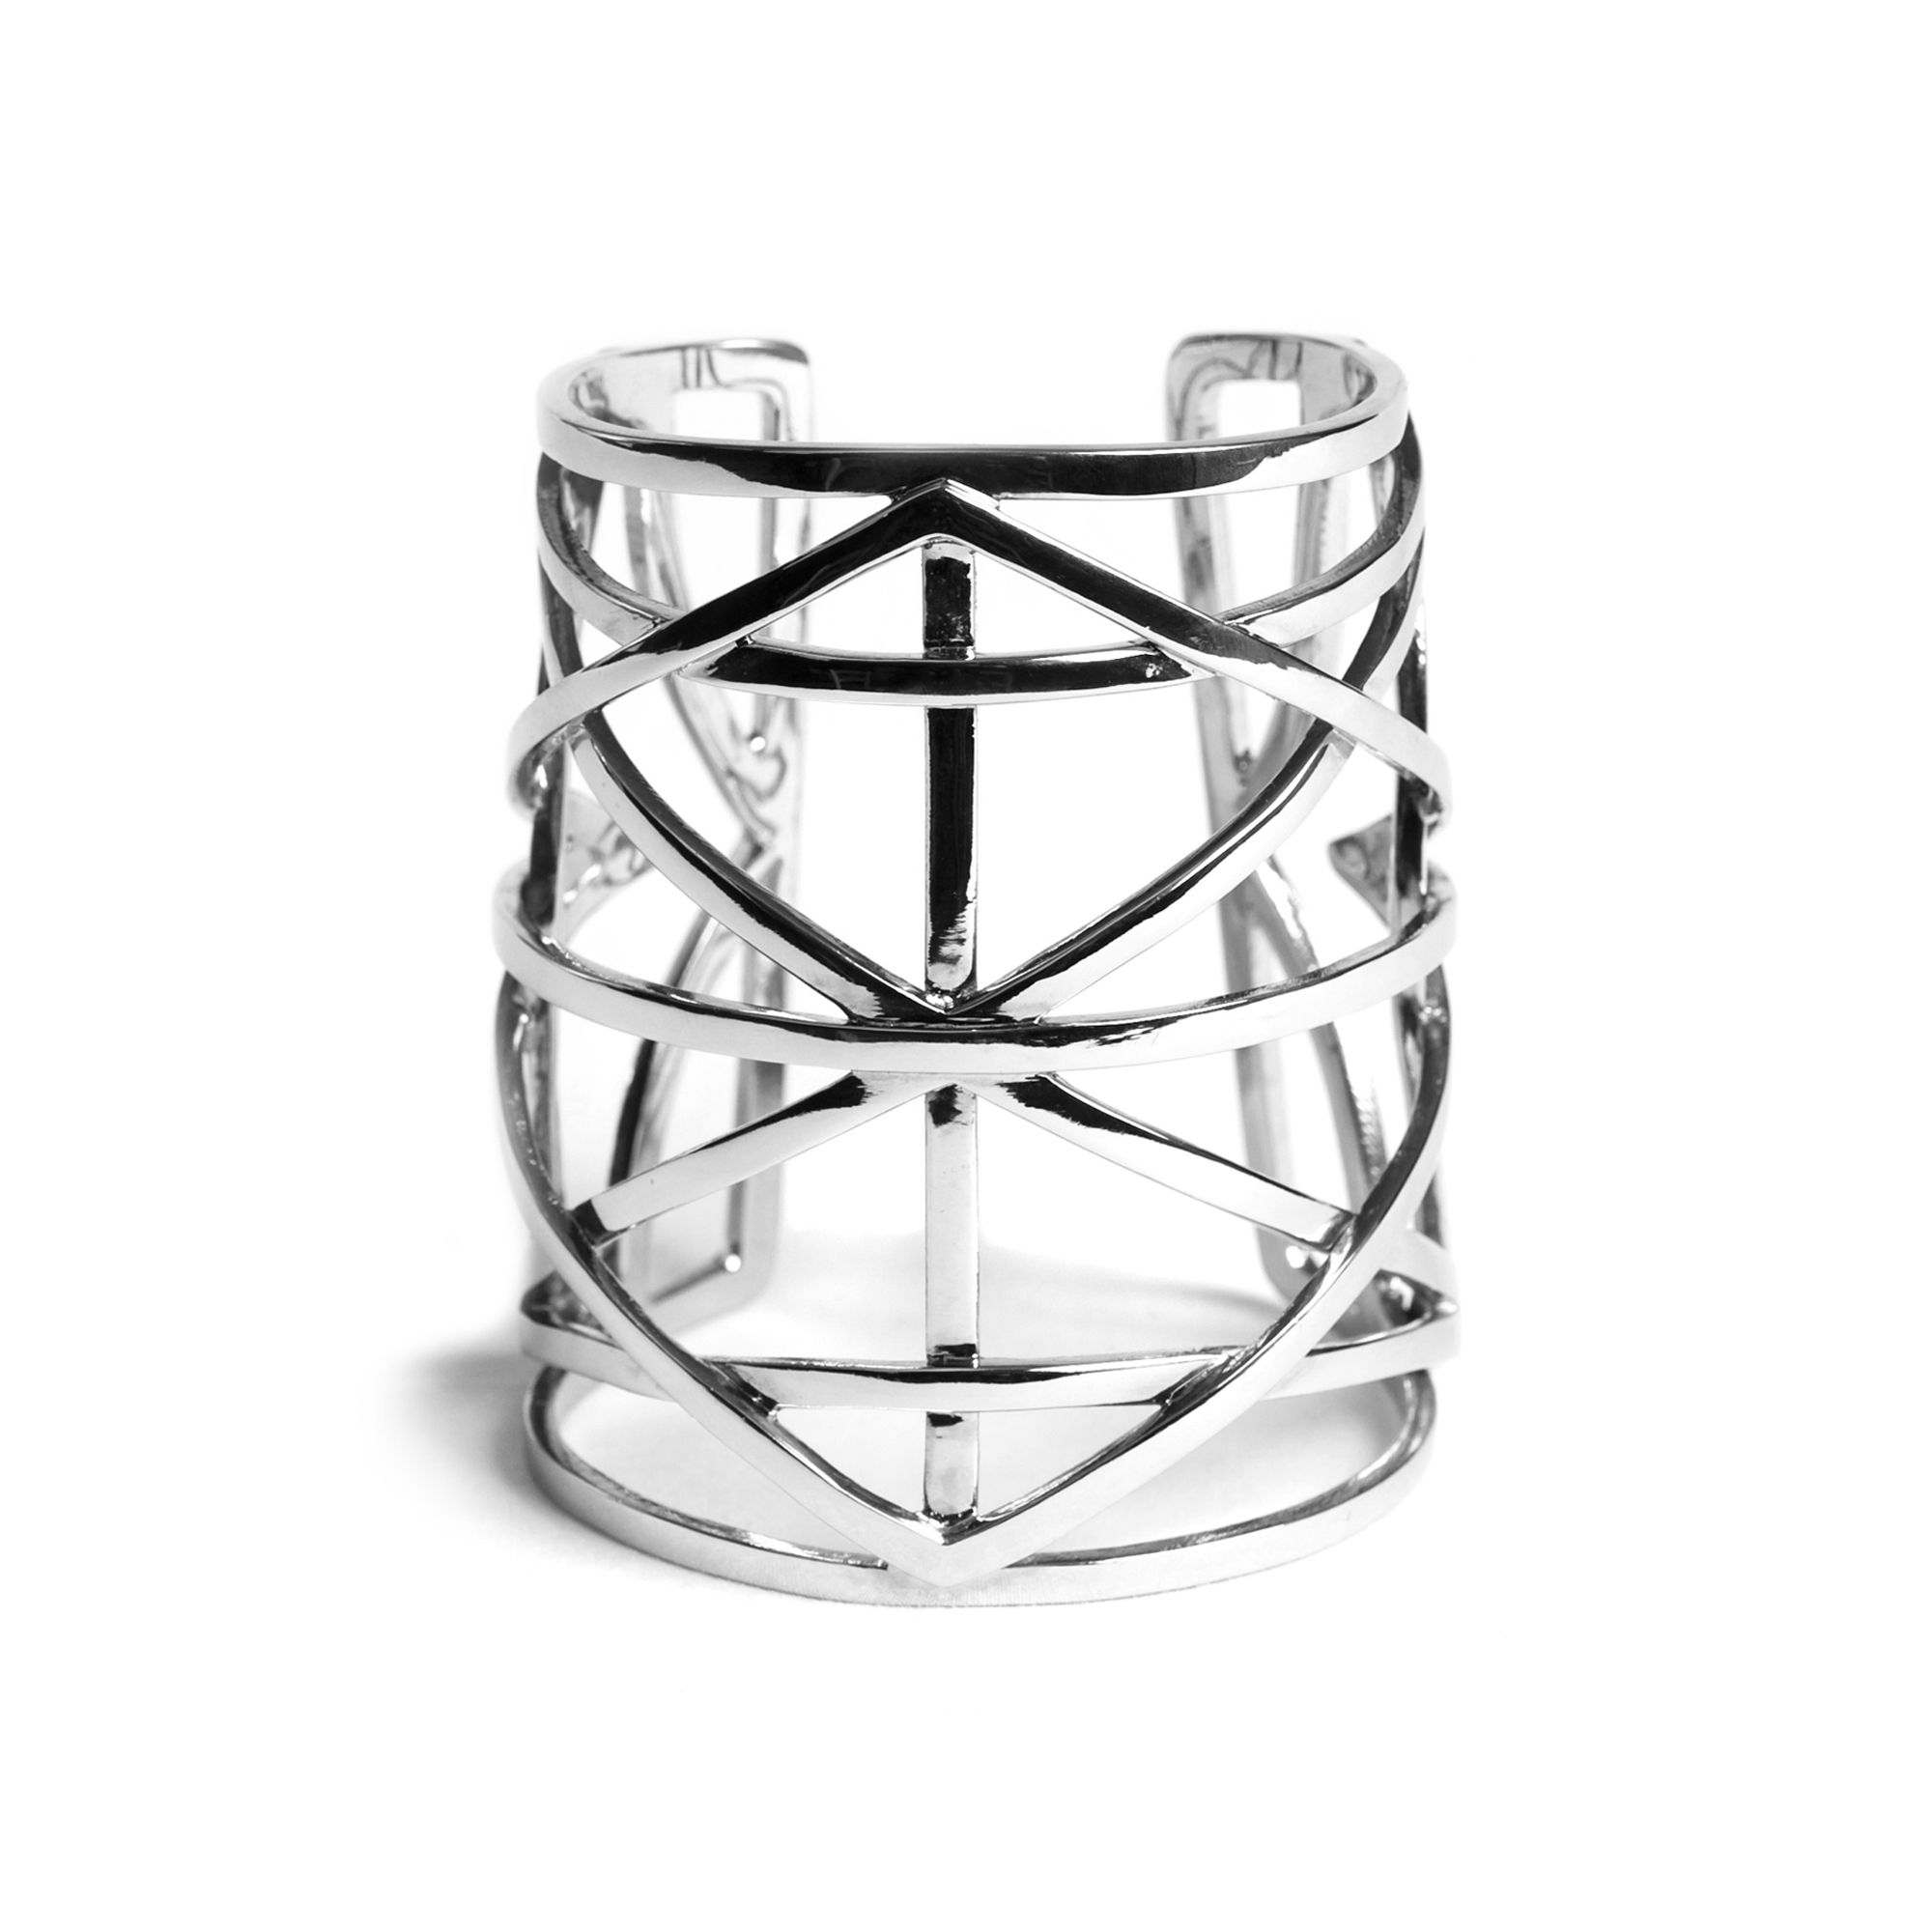 Silver 'Grill' cuff Slave cuff bracelet in silver